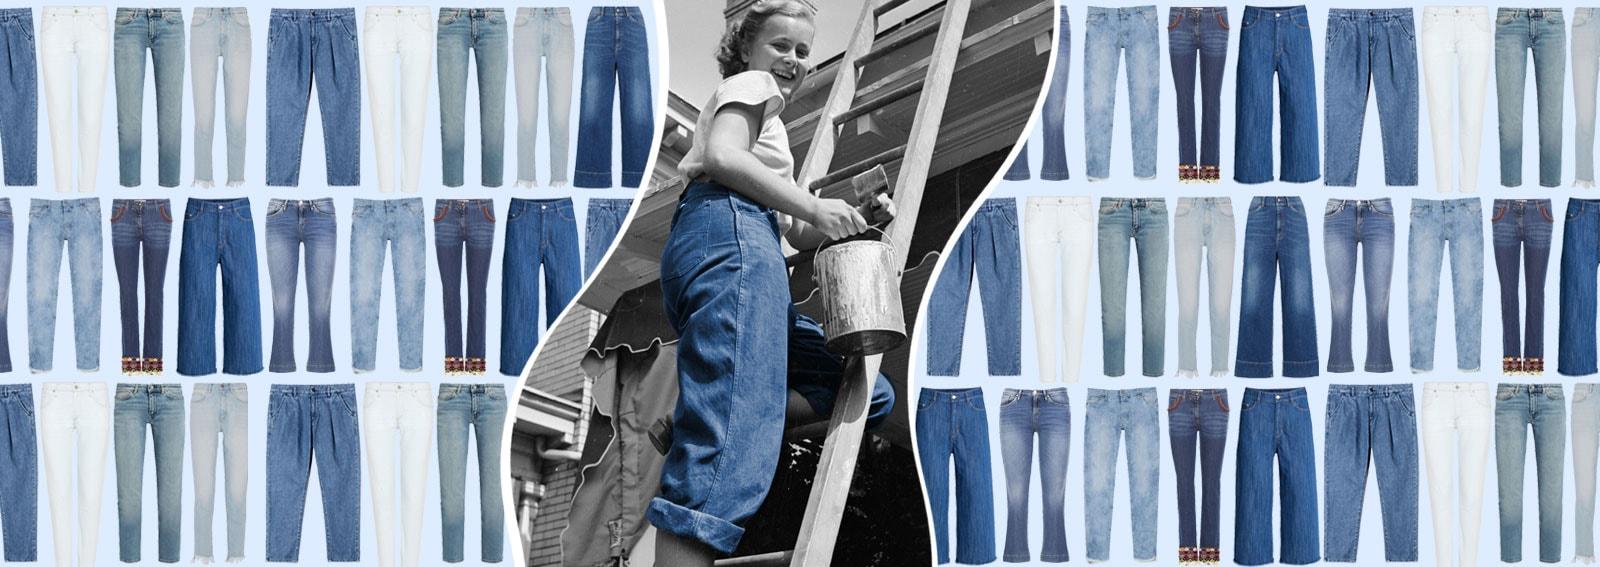 DESKTOP_cropped_jeans